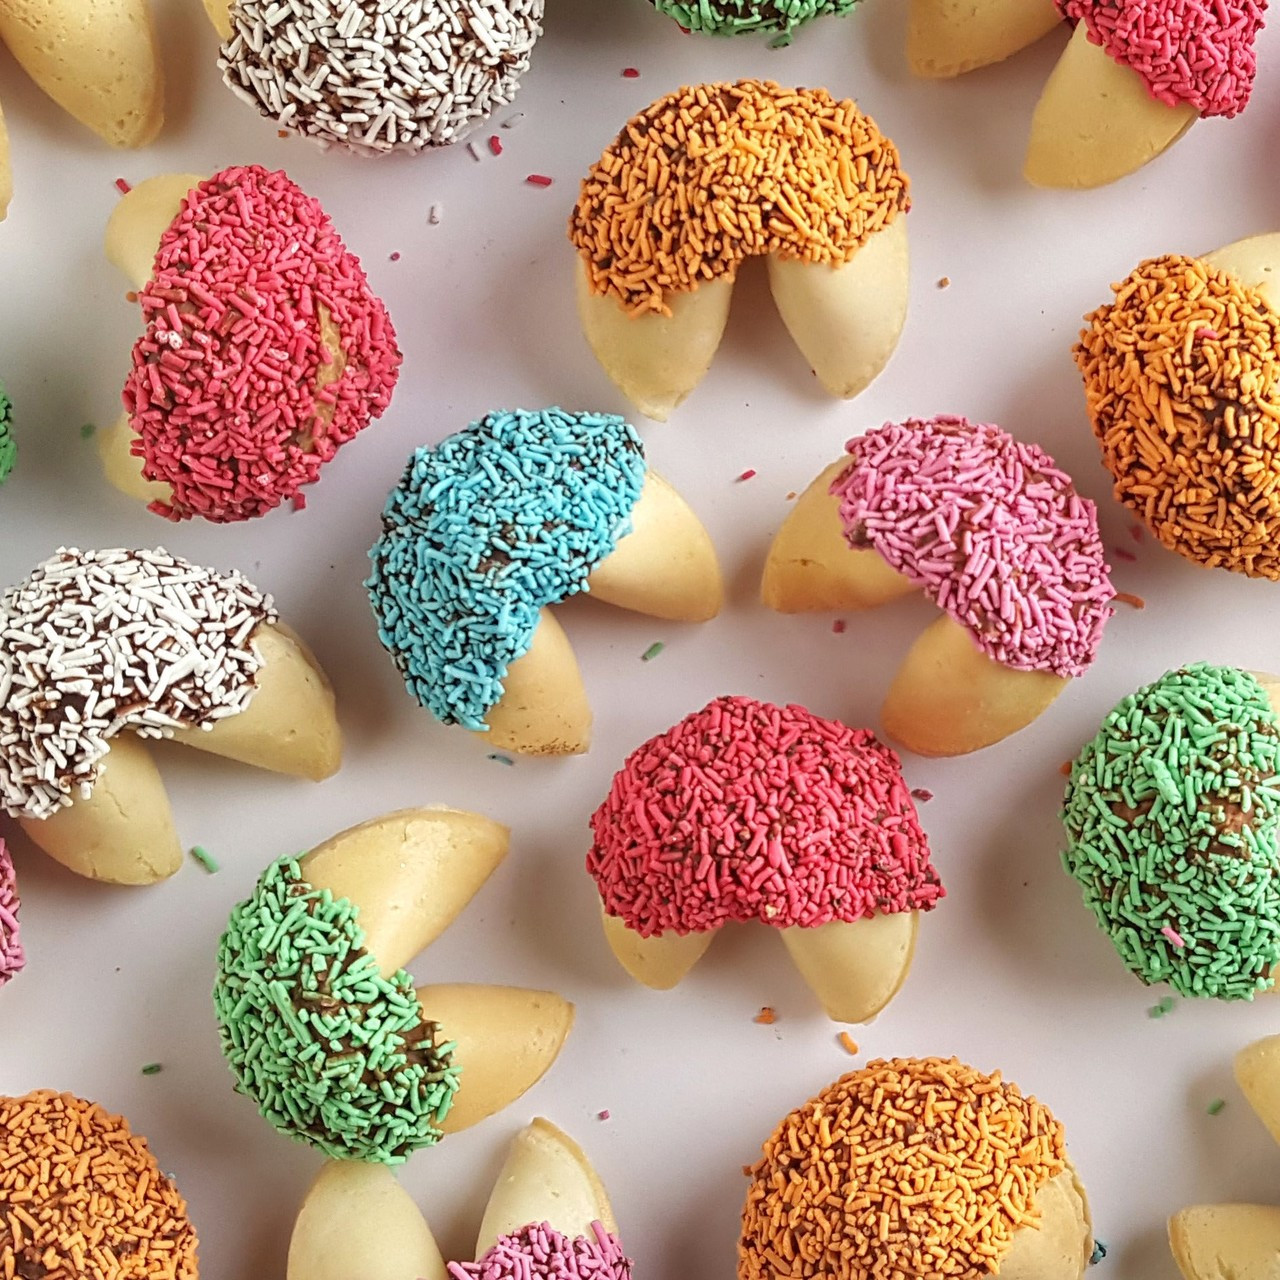 SPRINKLE Fortune Cookies - Amazeology Australia